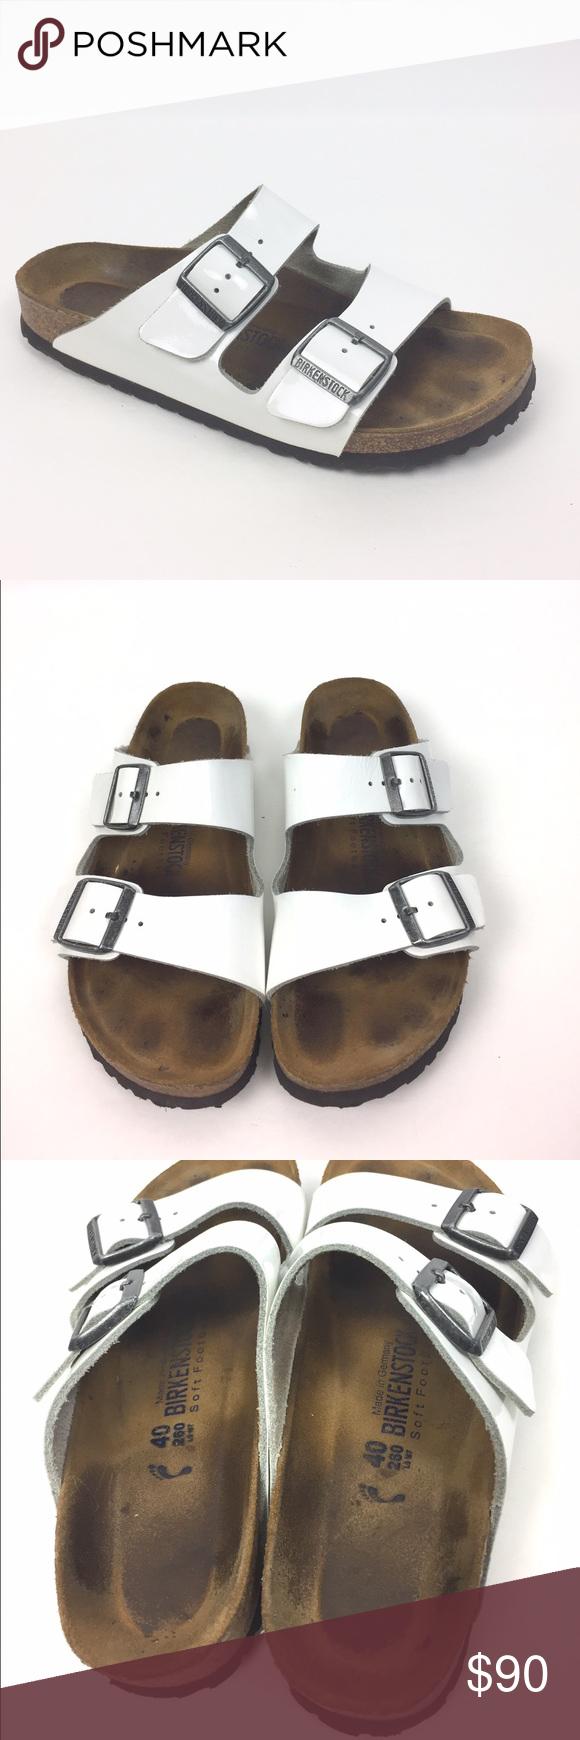 e28da9d47b3 Birkenstock White Patent Leather Arizona Sandal 40